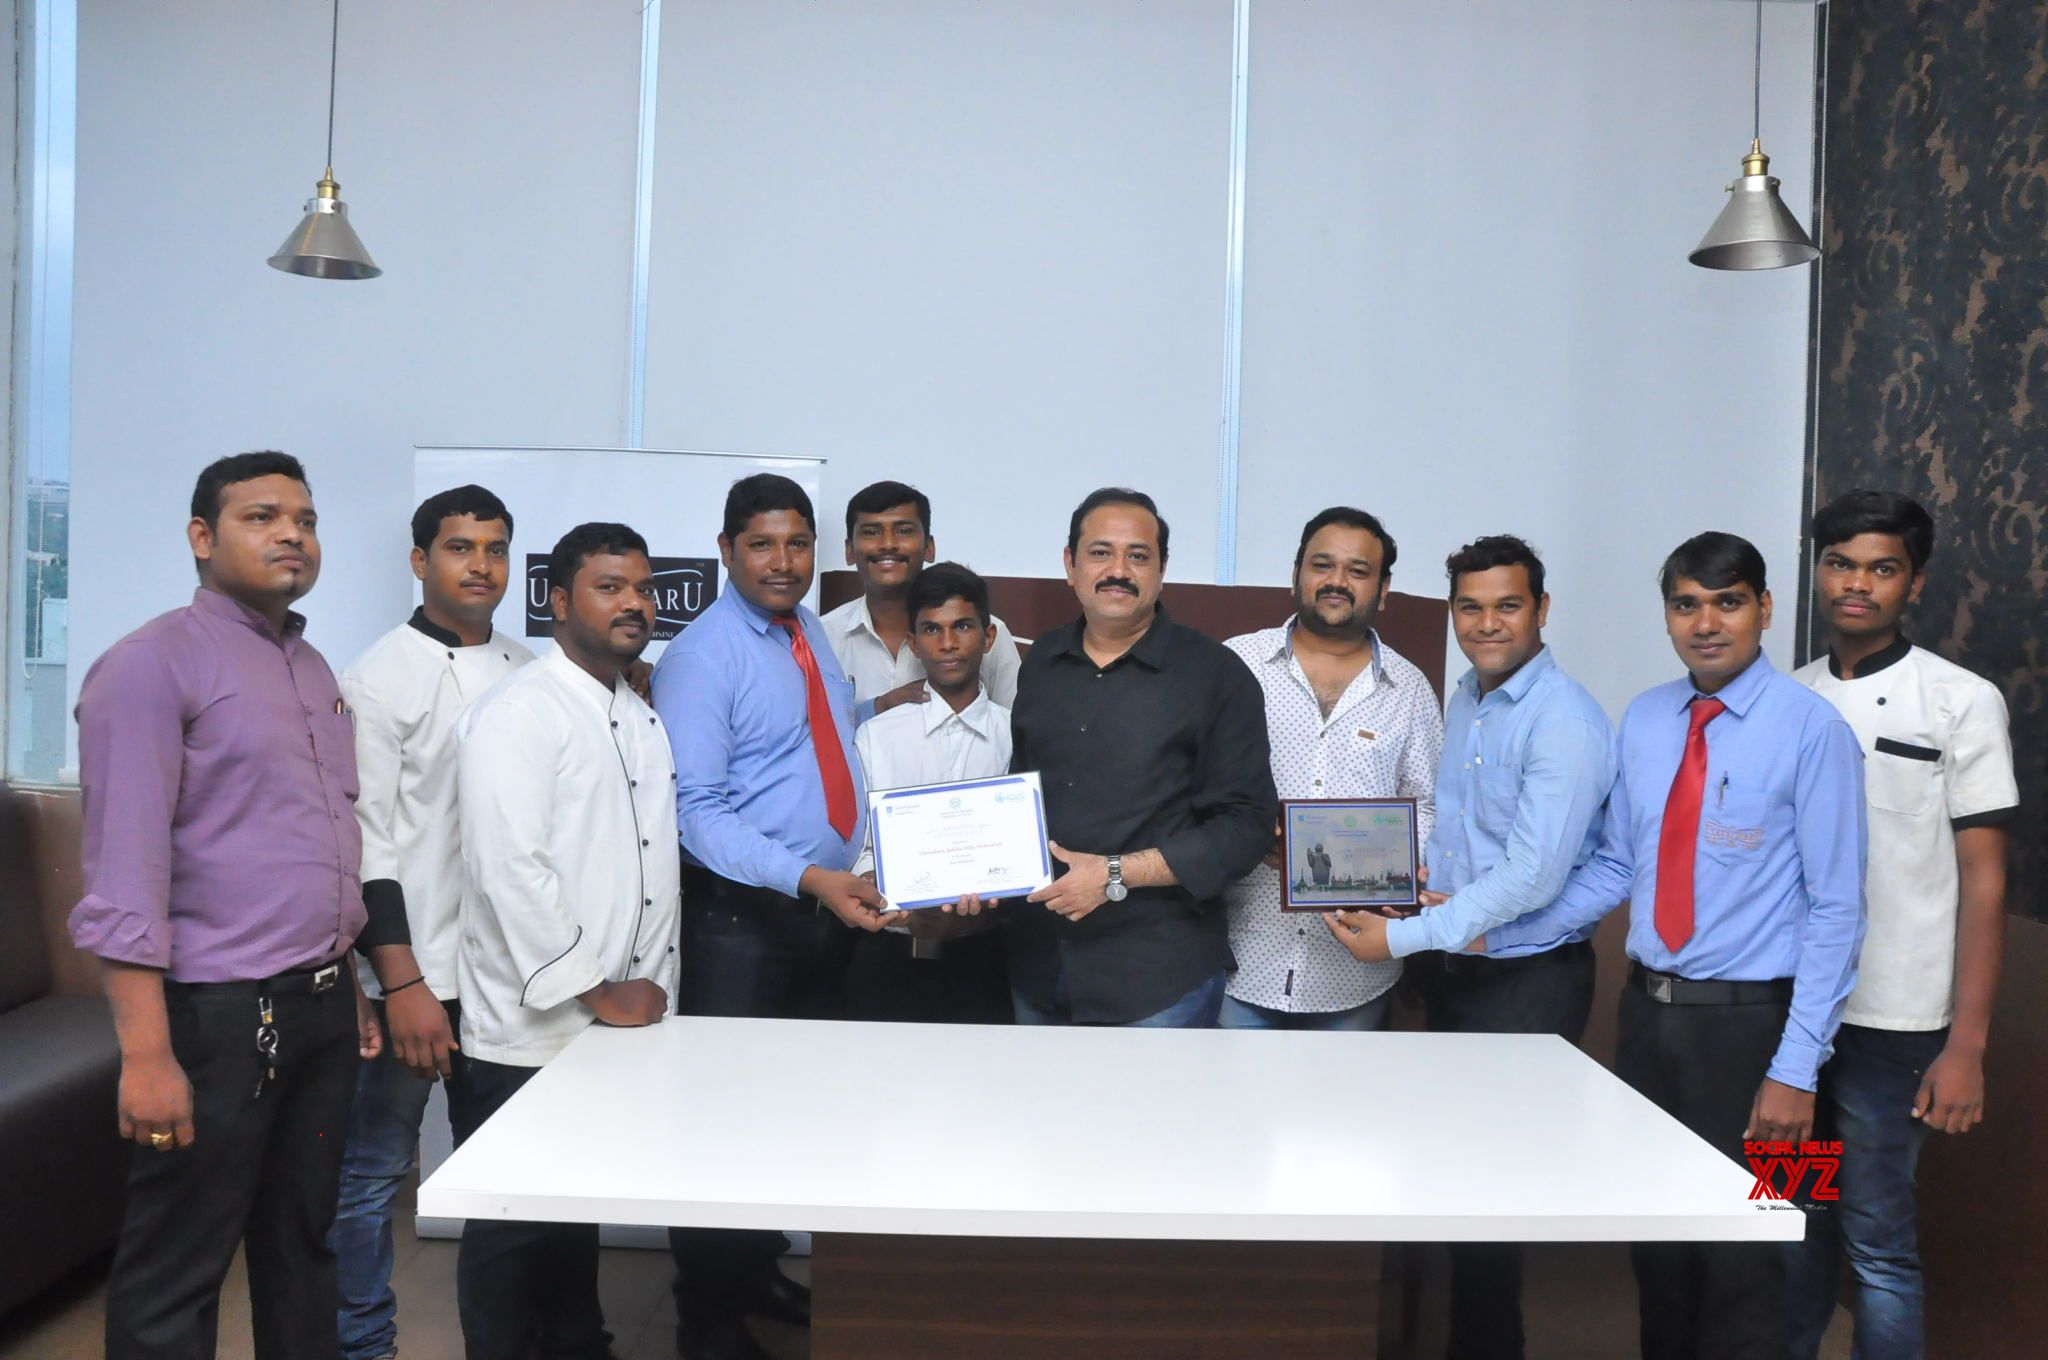 Telangana Government felicitated UlavacharU with 2017 Best Restaurant Award